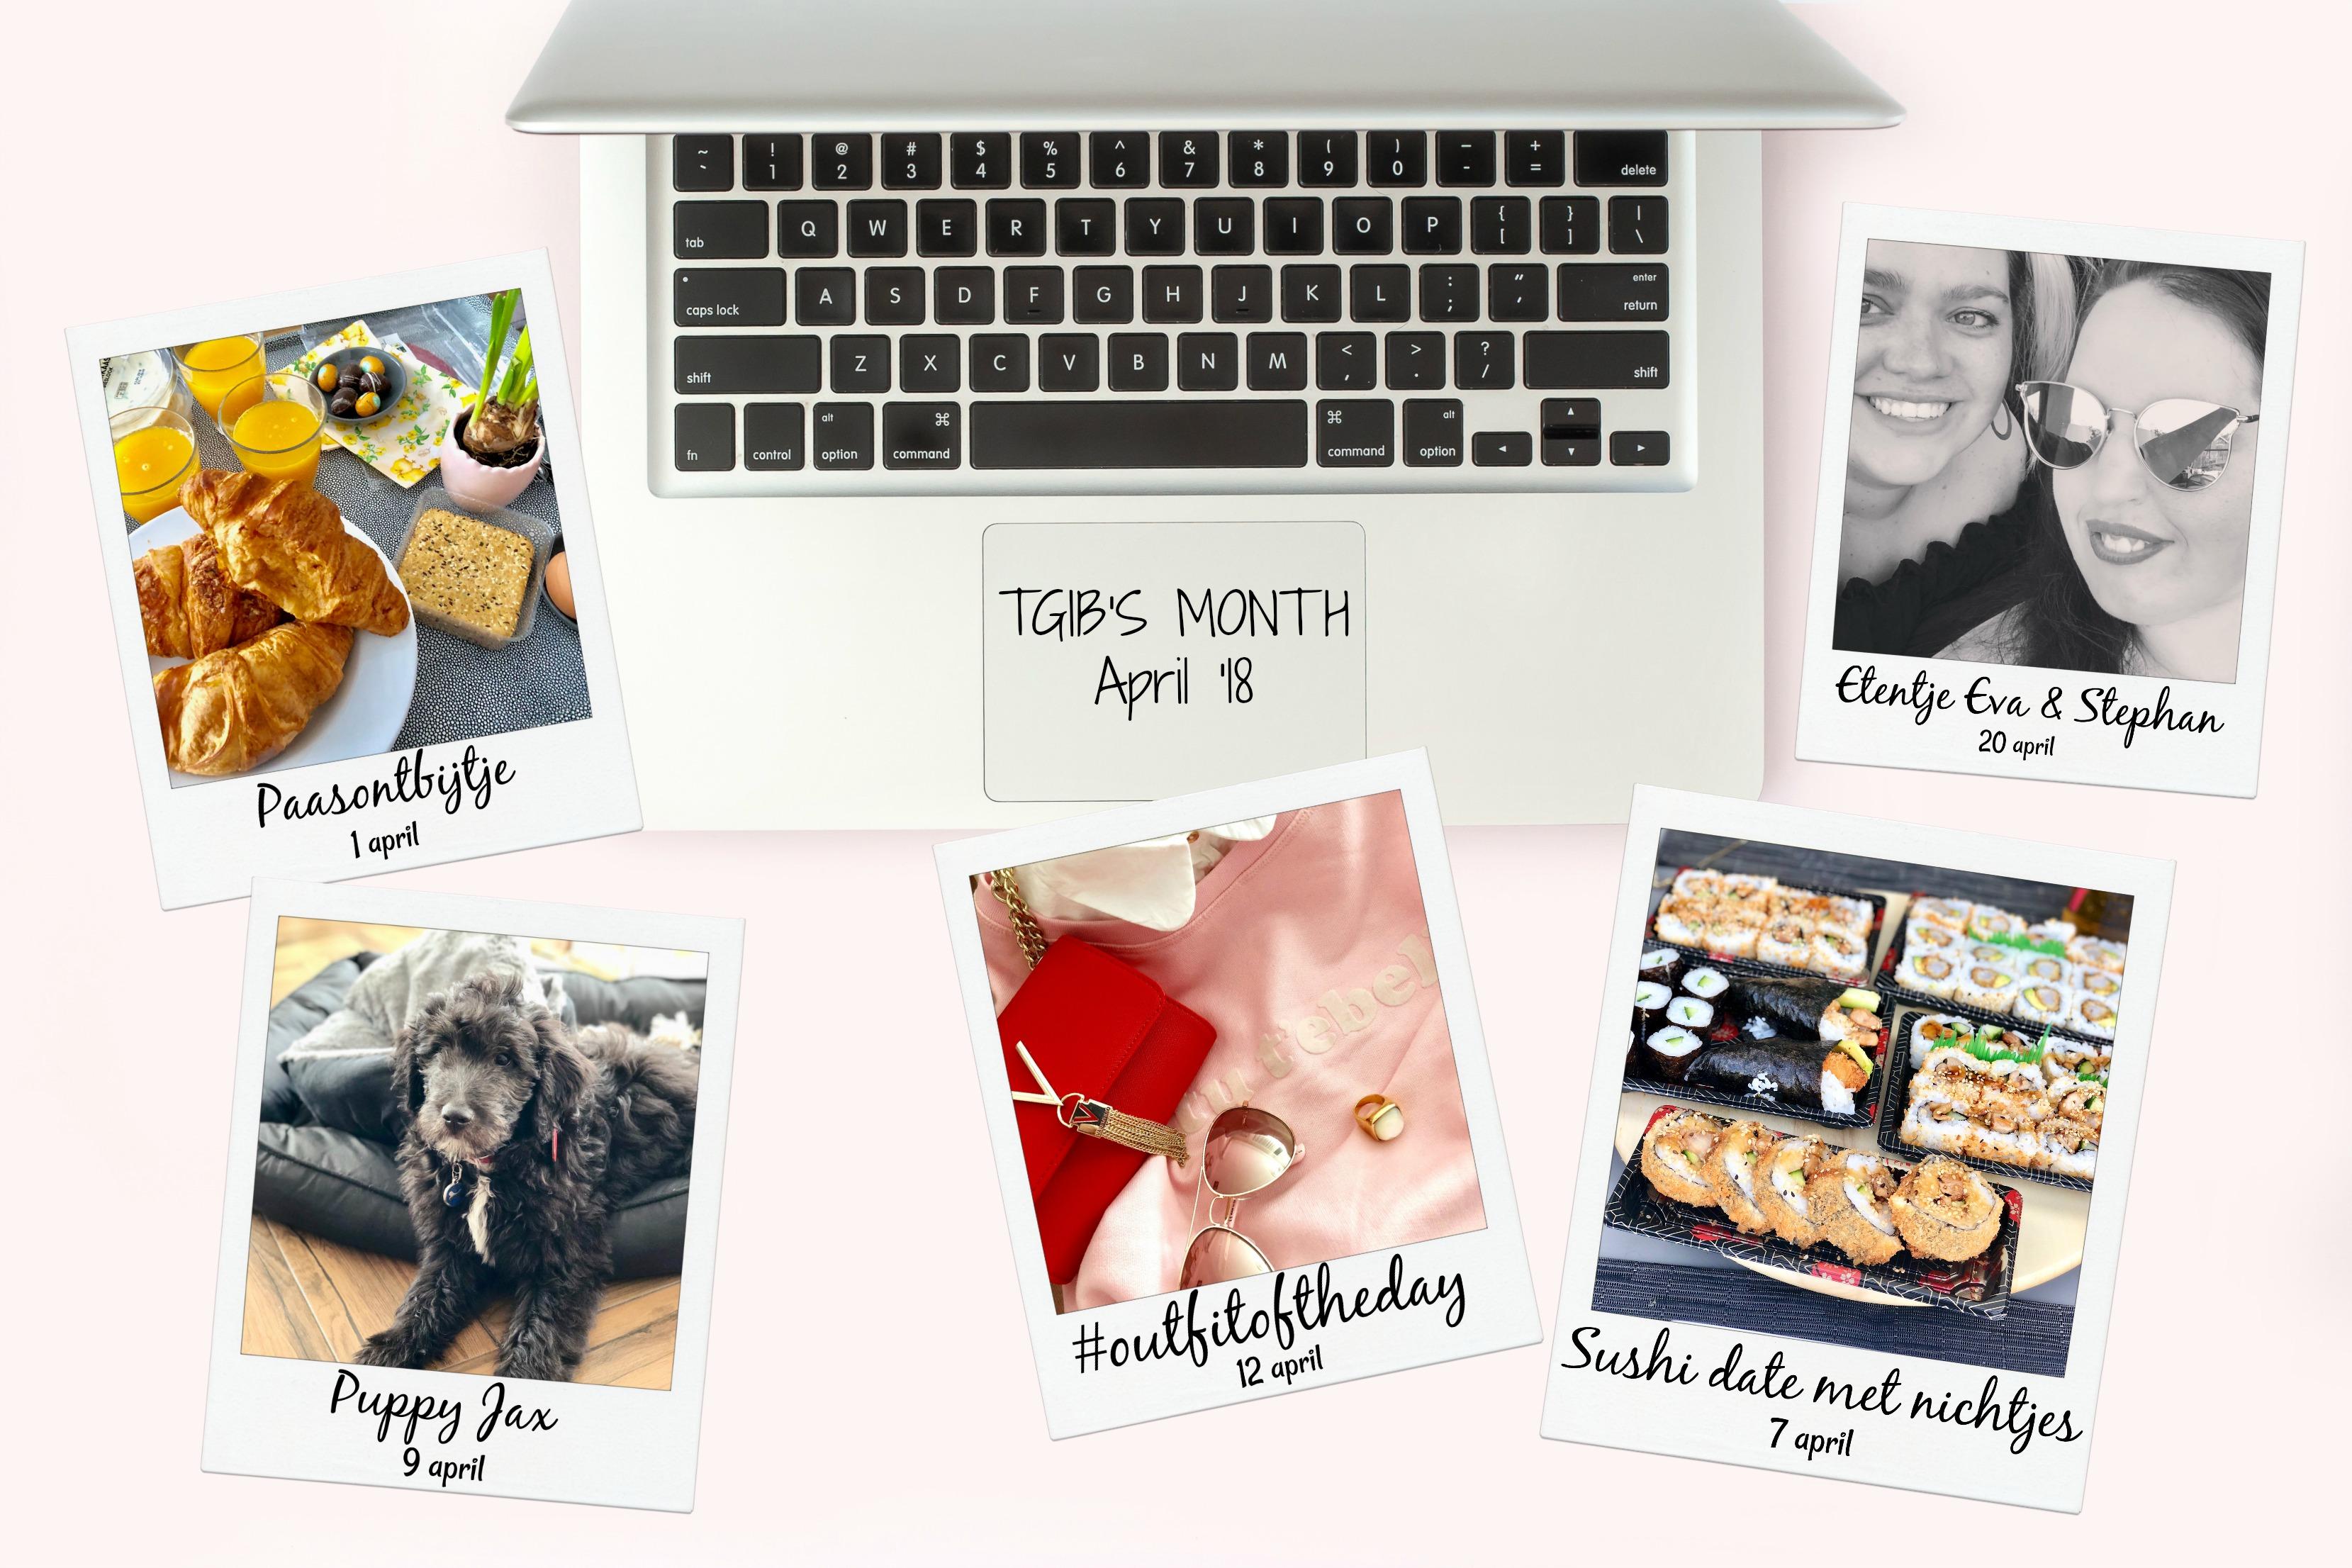 TGIB's Month april '18